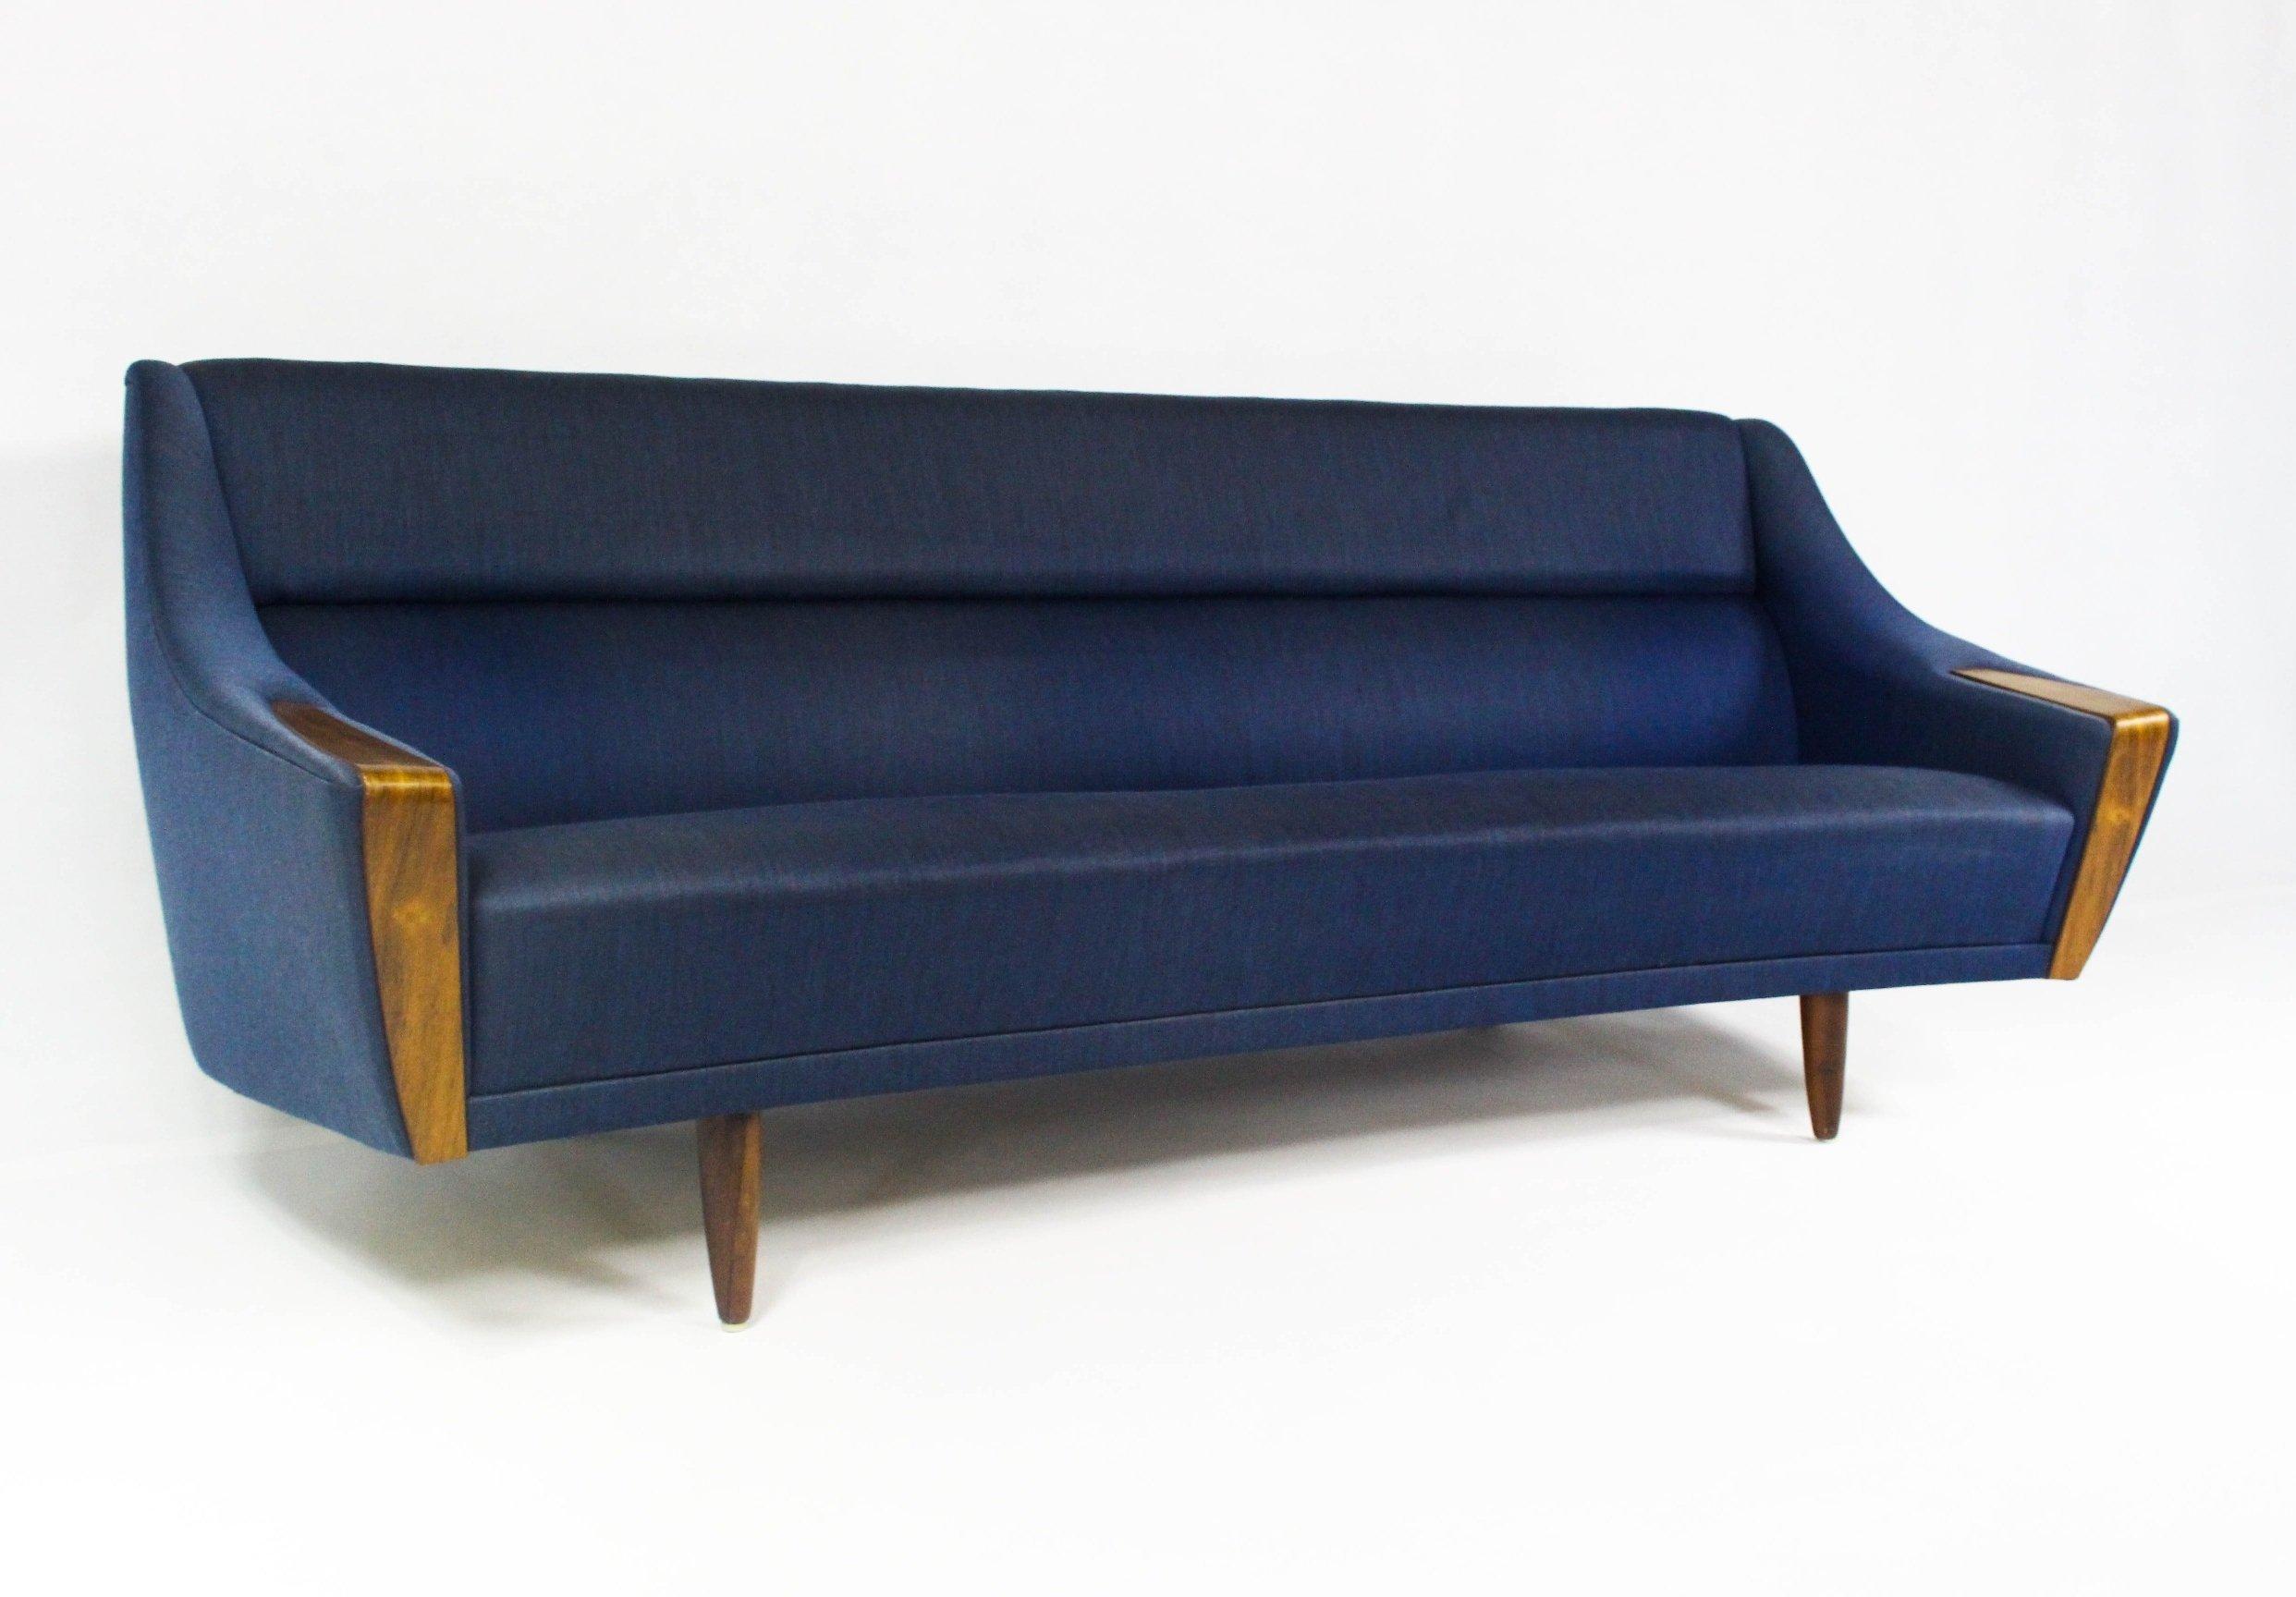 Luxury sectional sofa kijiji ottawa sectional sofas for Sectional sofa kijiji ottawa